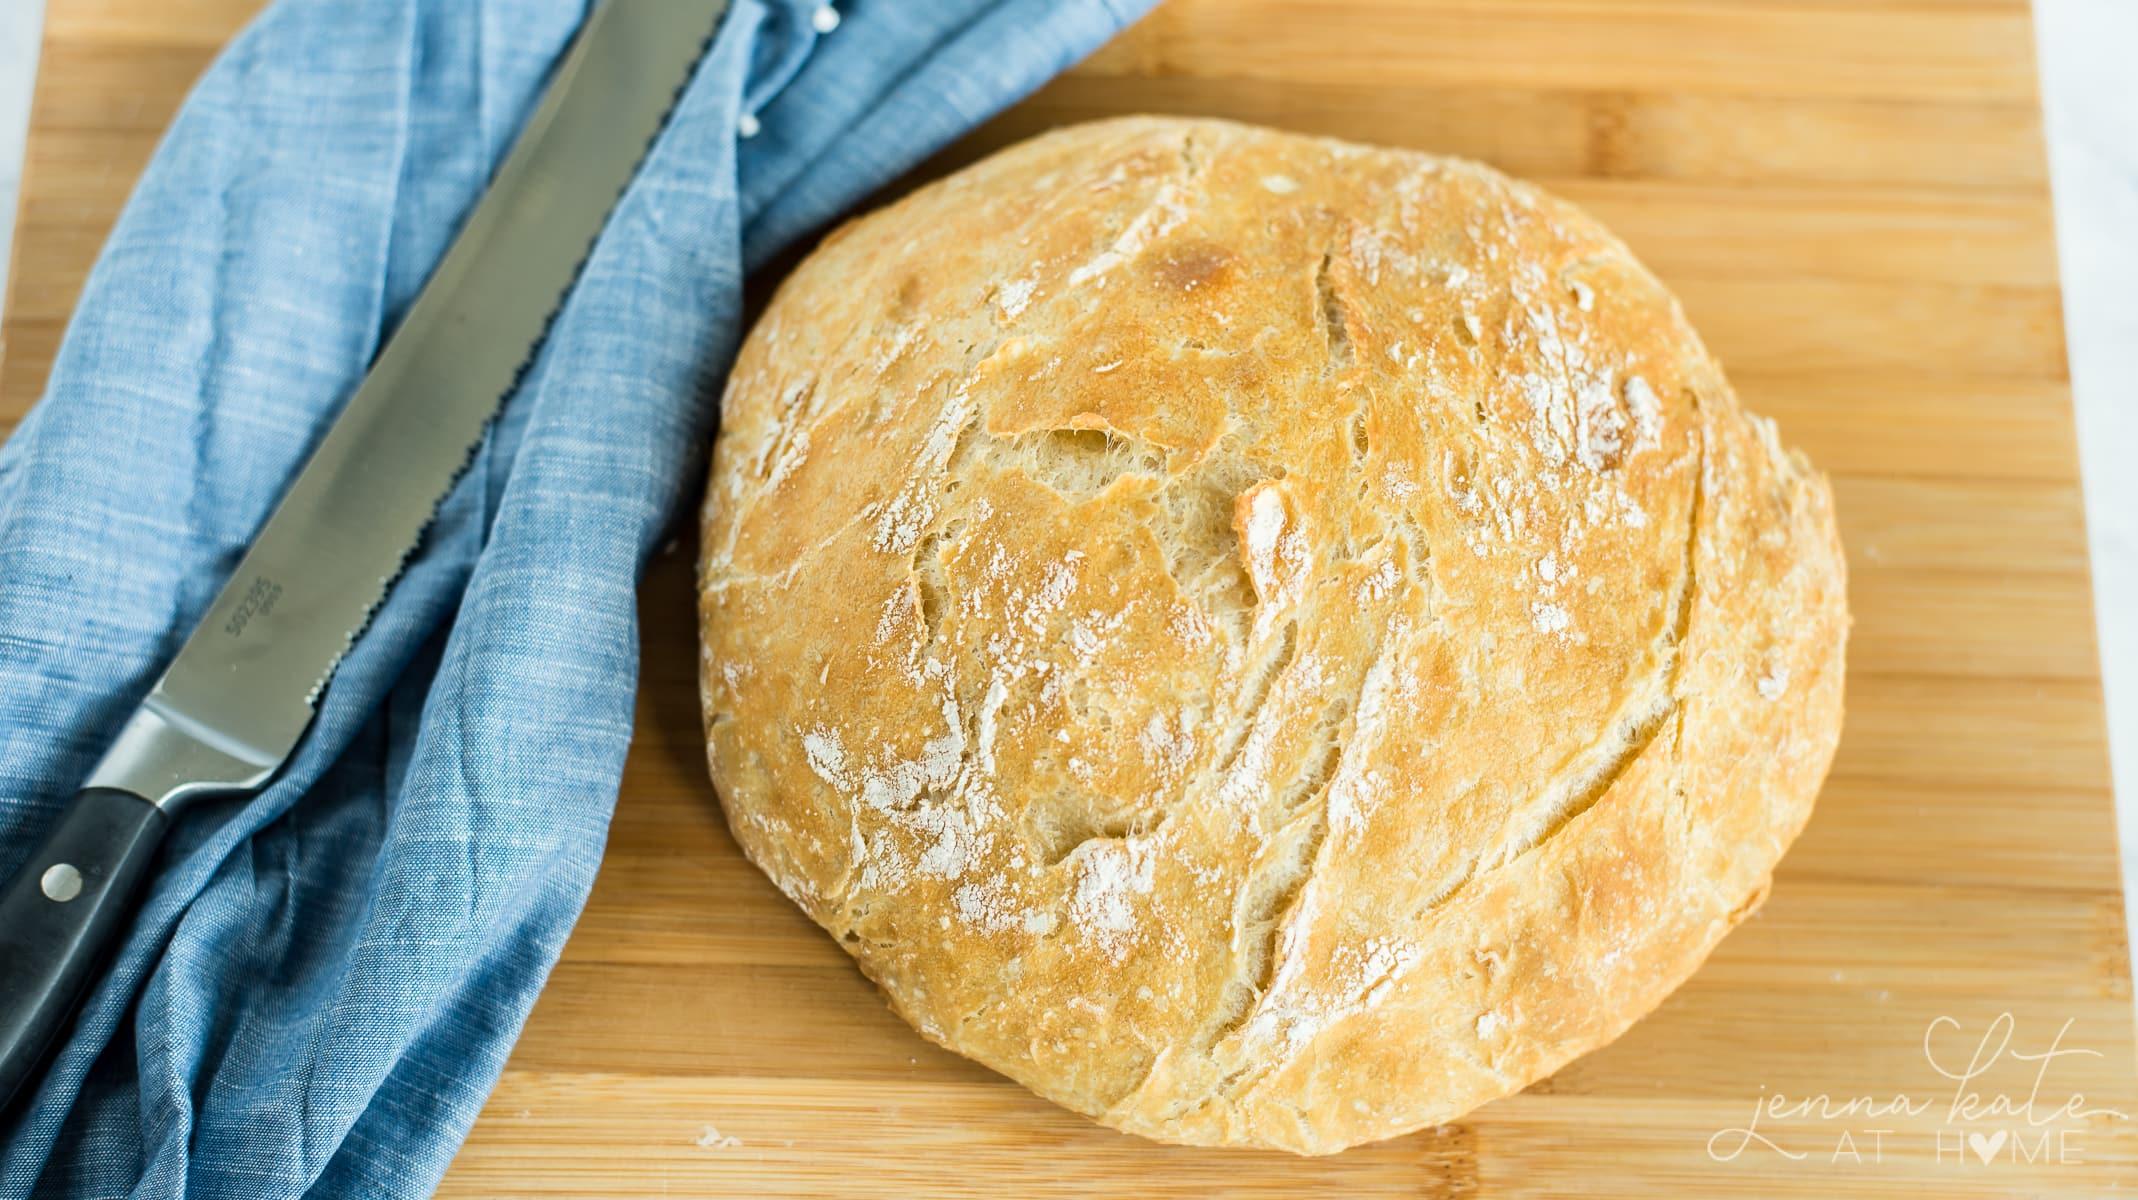 quick crunch artisanal bread recipe